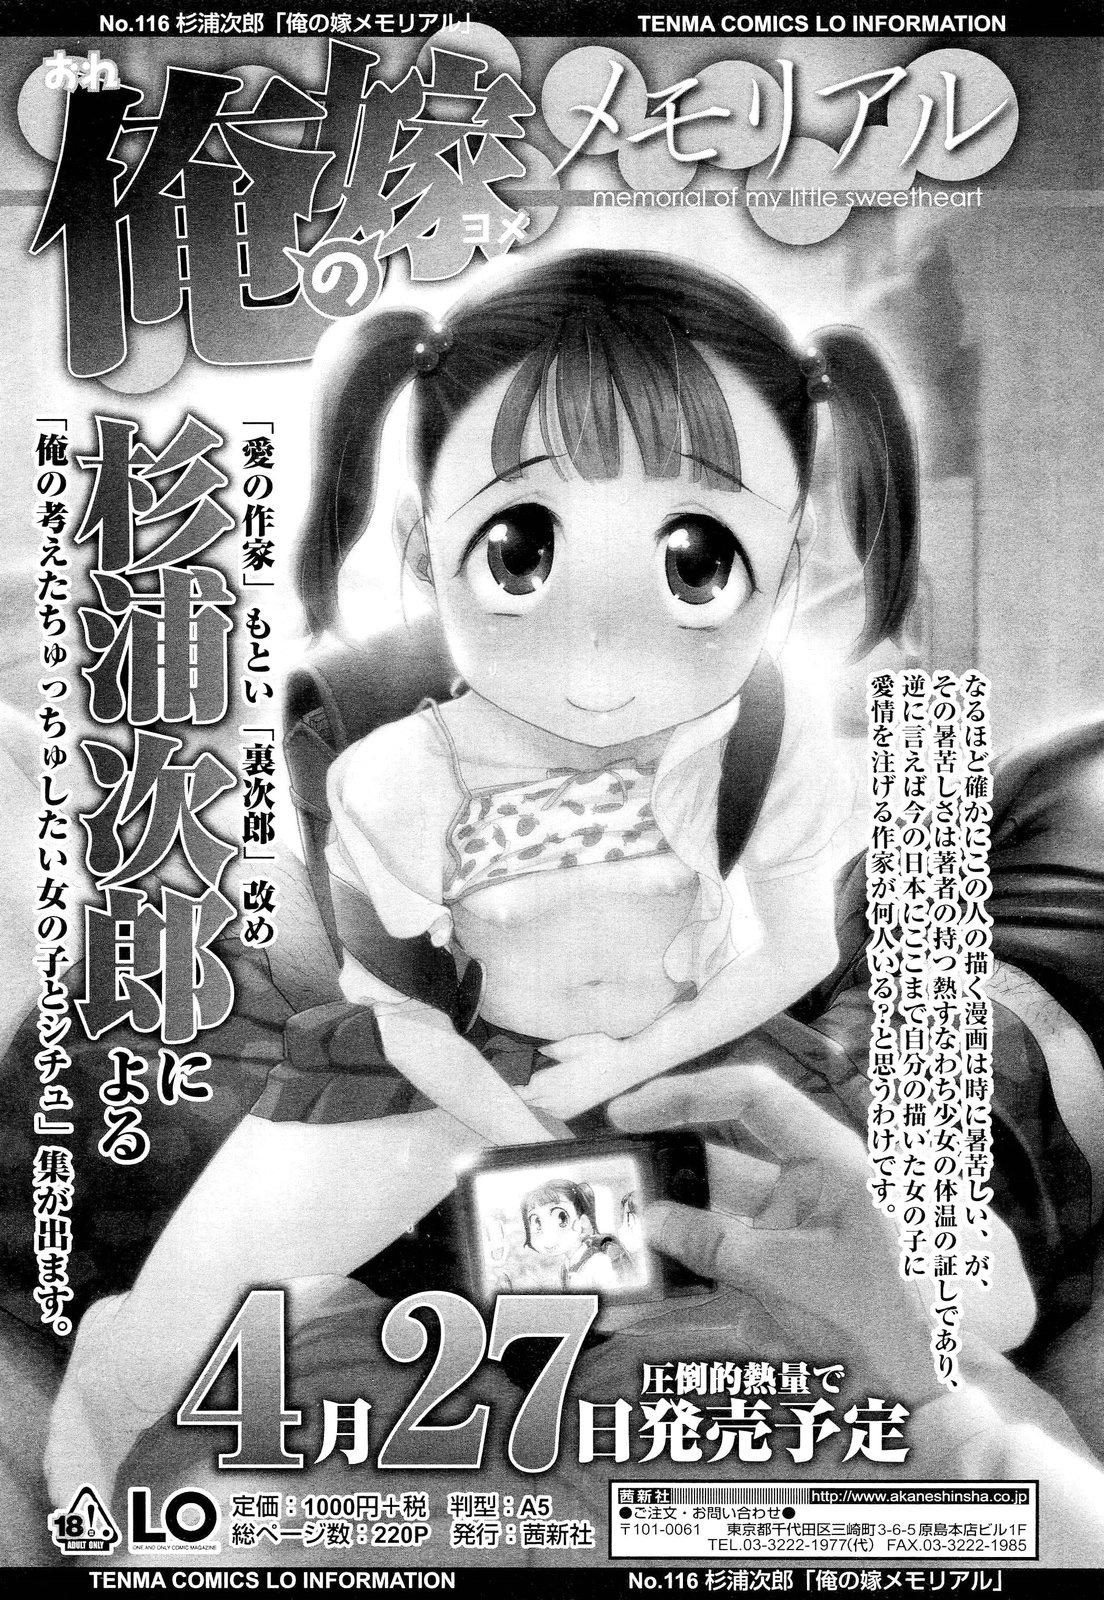 COMIC LO 2012-05 Vol. 98 436